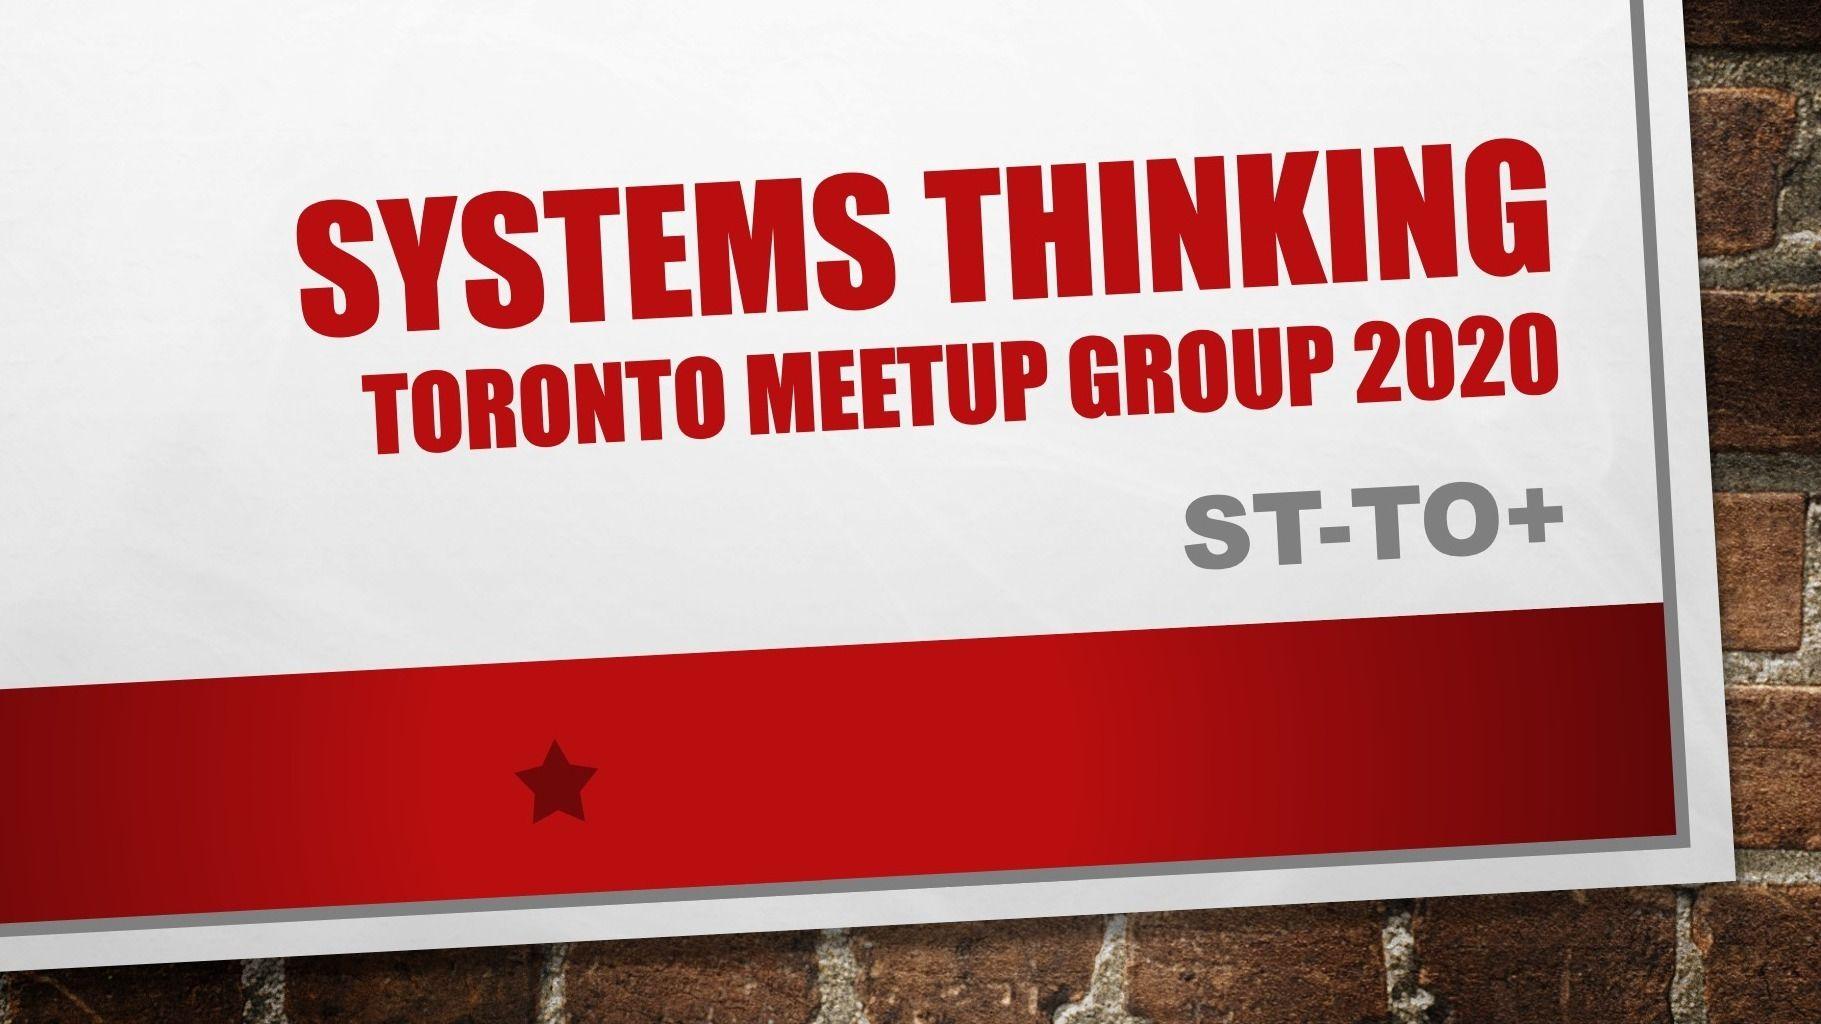 SystemsThinkingTO